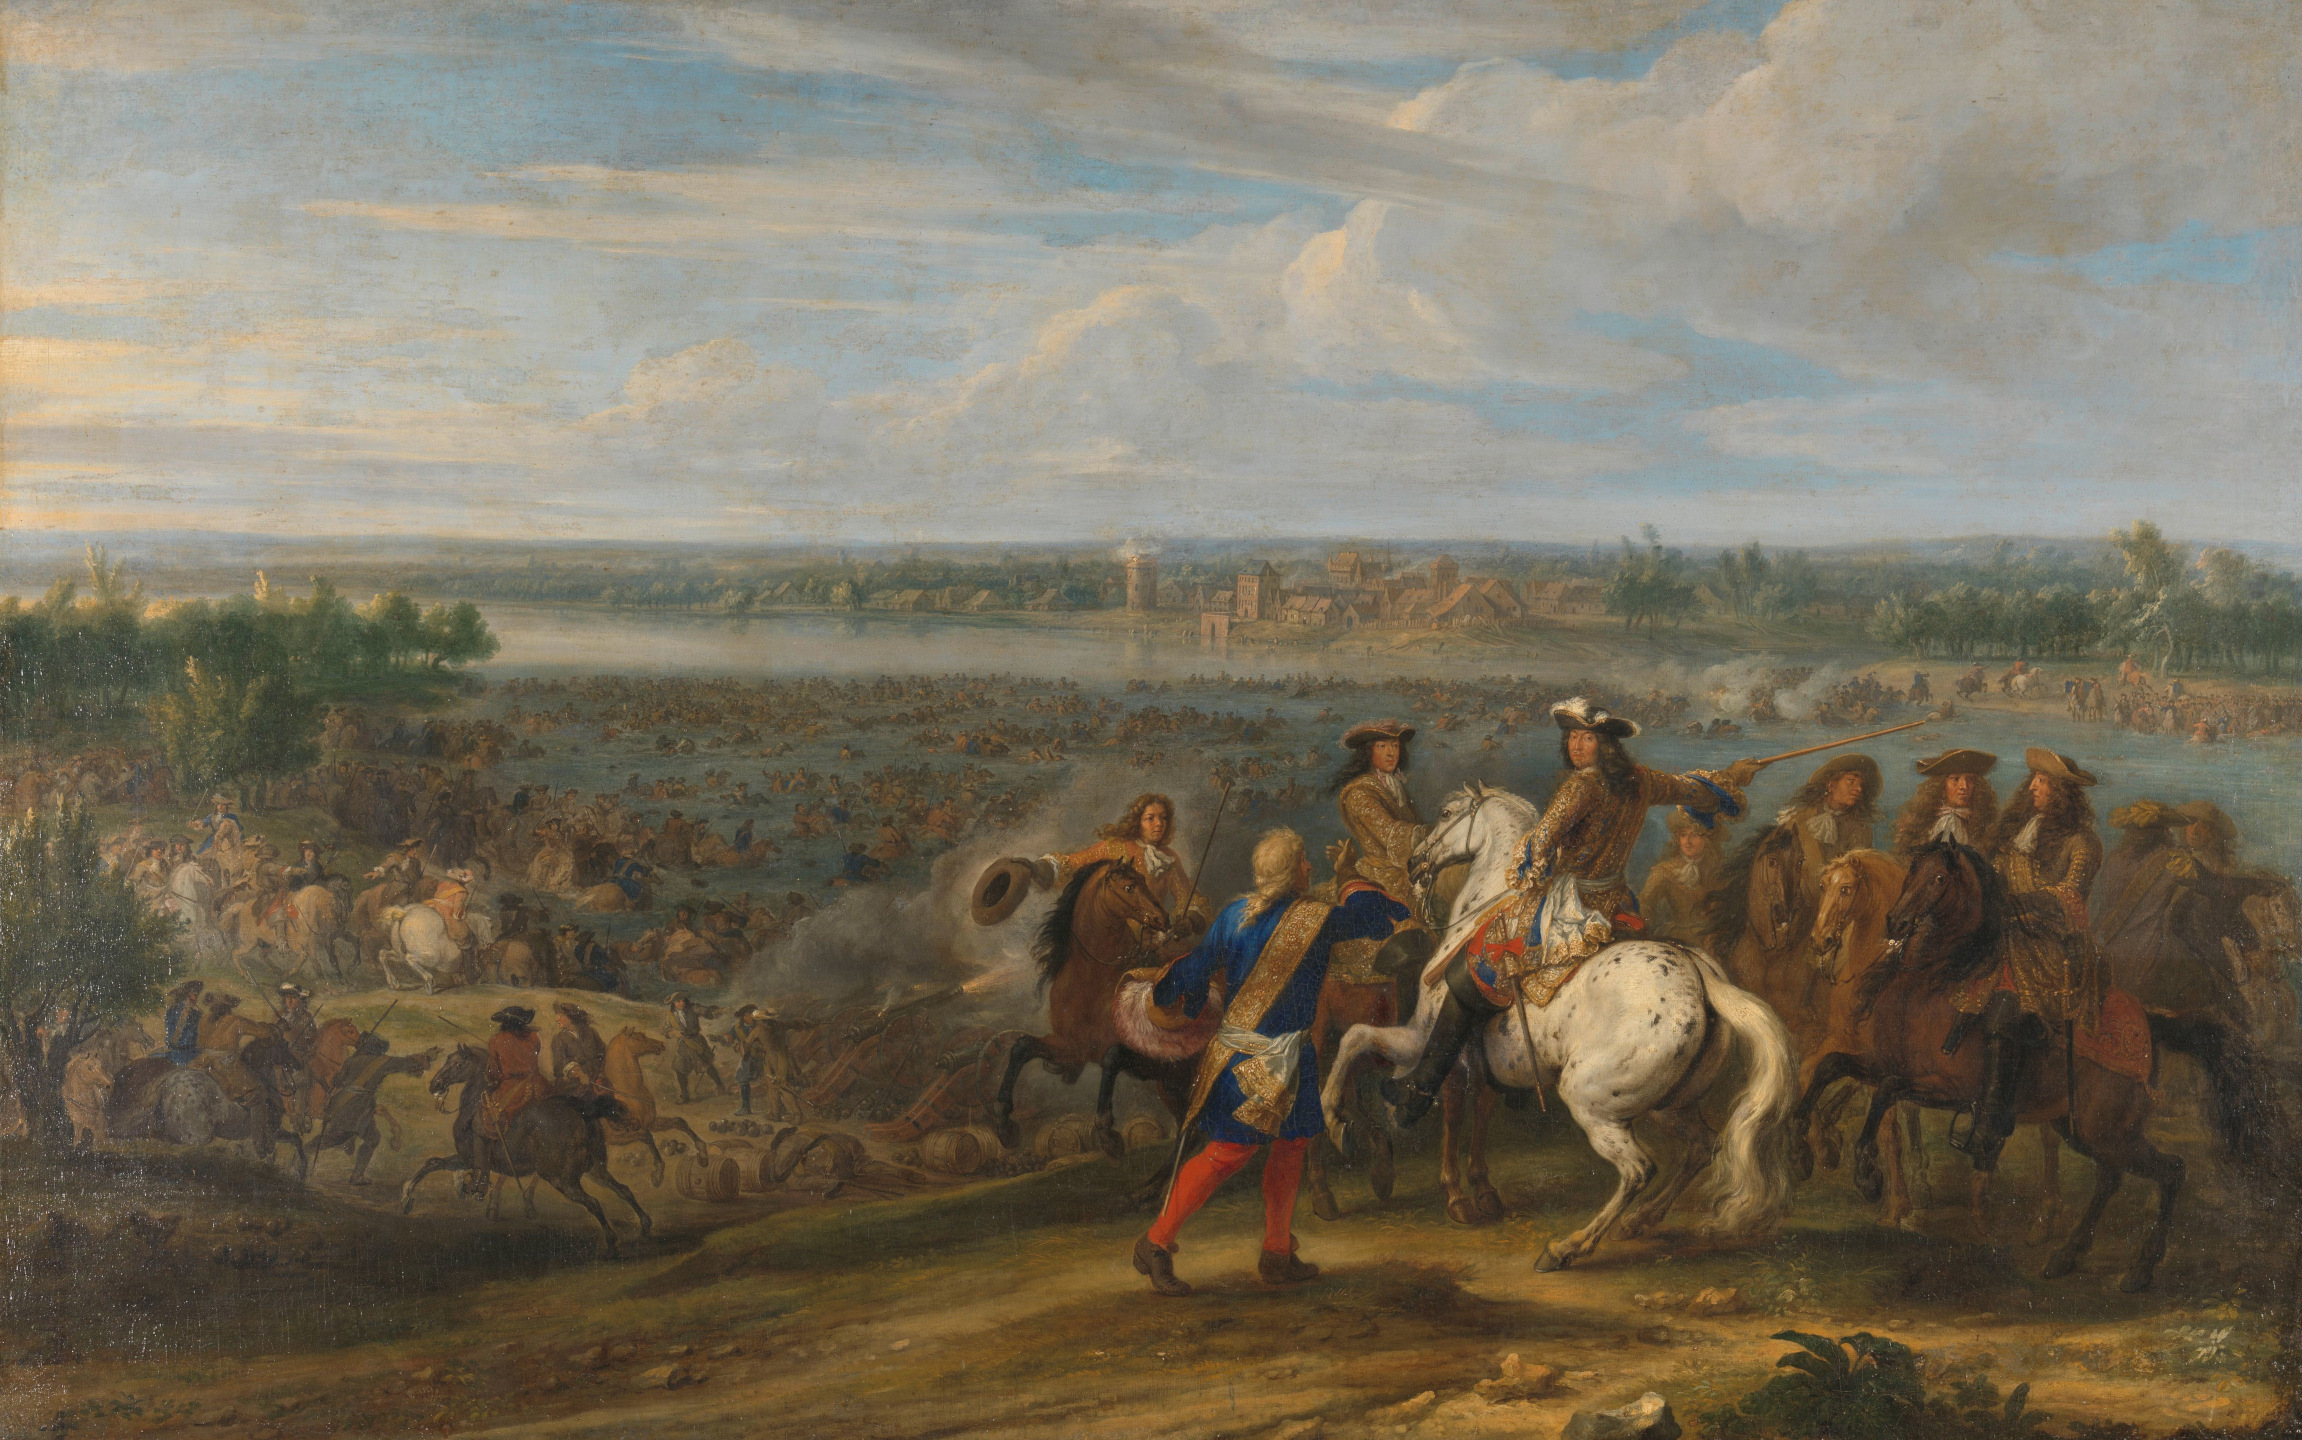 Adam Frans van der Meulen: Ludwig XIV. überquert den Rhein bei Lobith